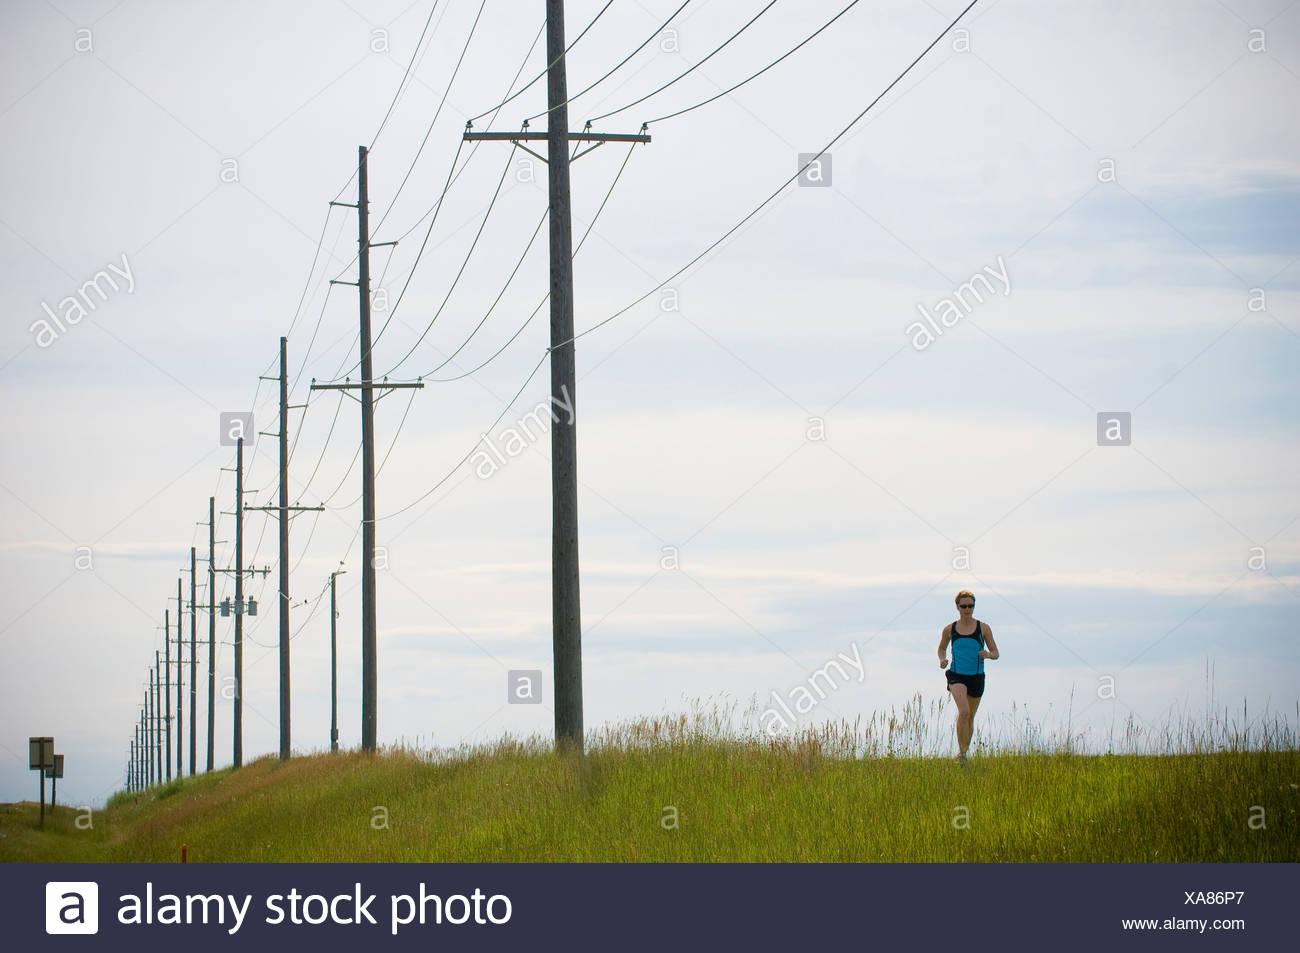 Woman running beneath power lines, Bozeman, Gallatin County, Montana, USA - Stock Image